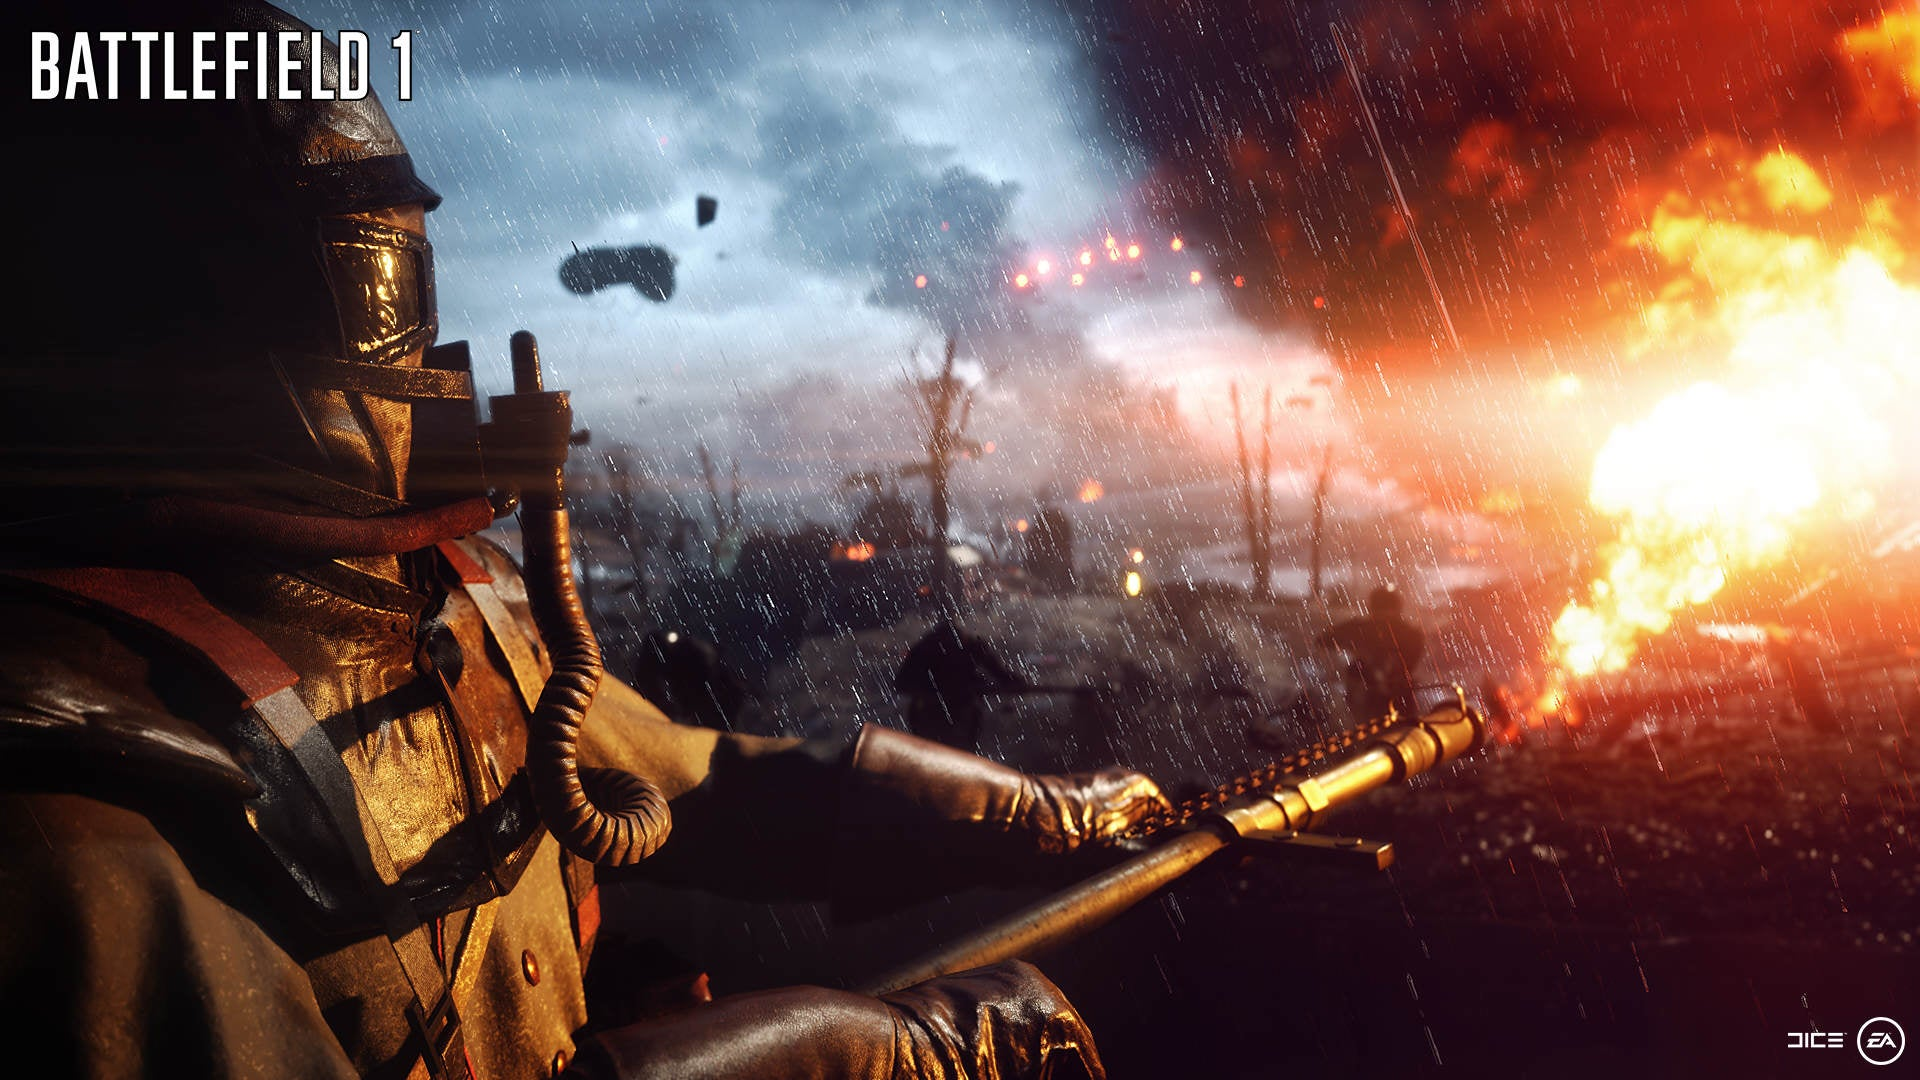 Battlefield 1 Publisher Under Fire After World War I Tweets